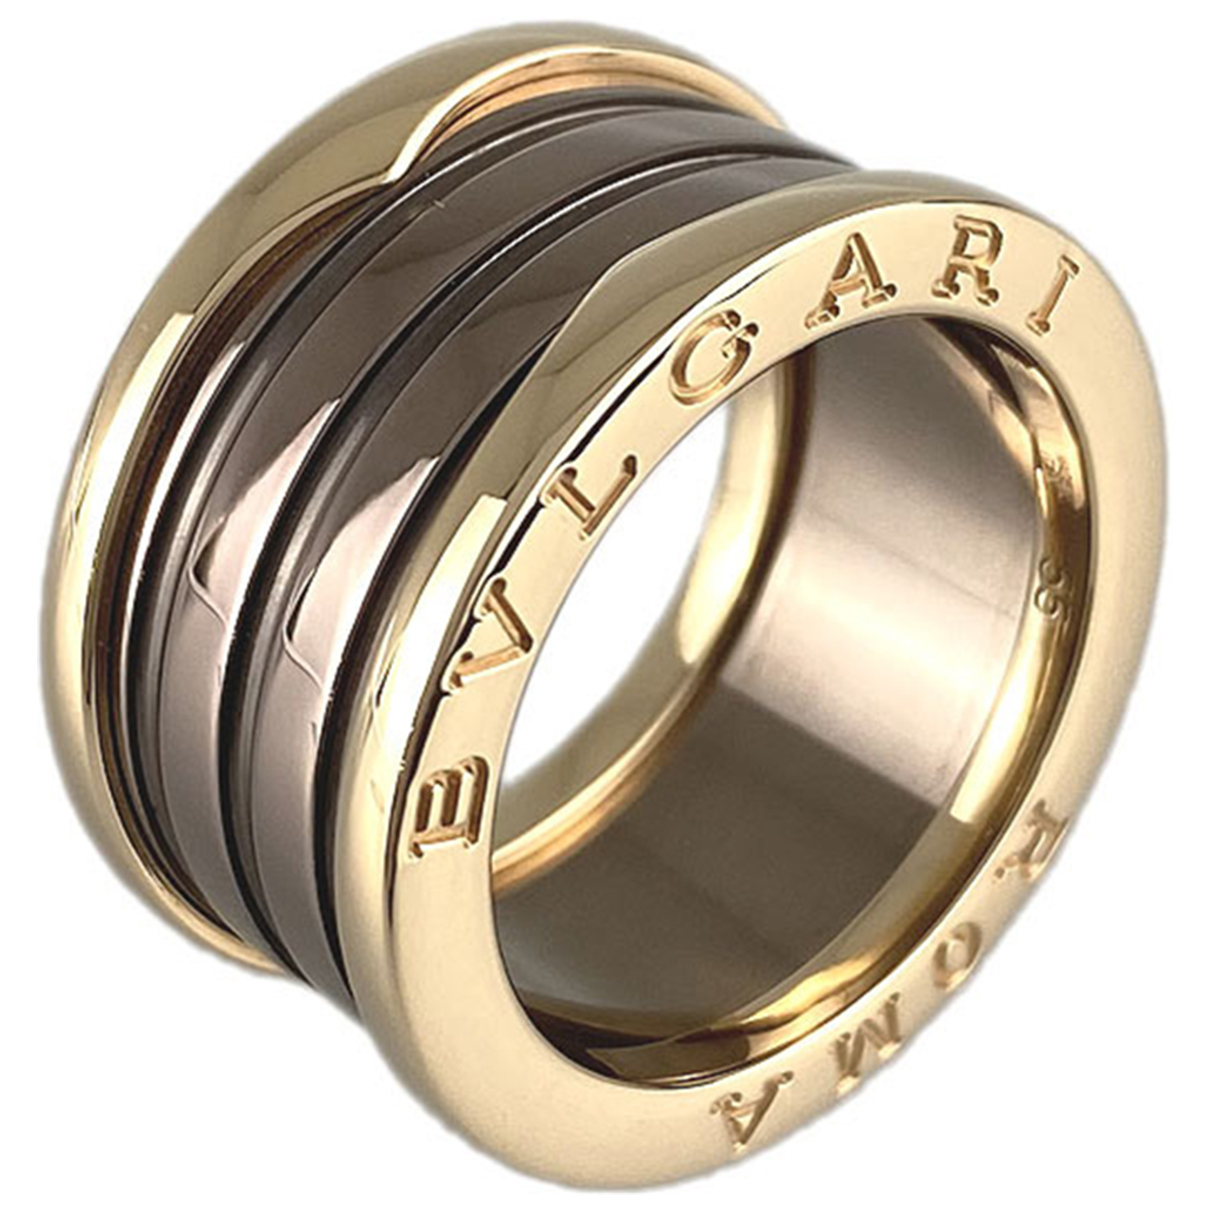 Bvlgari - Bague B.Zero1 pour femme en or jaune - dore